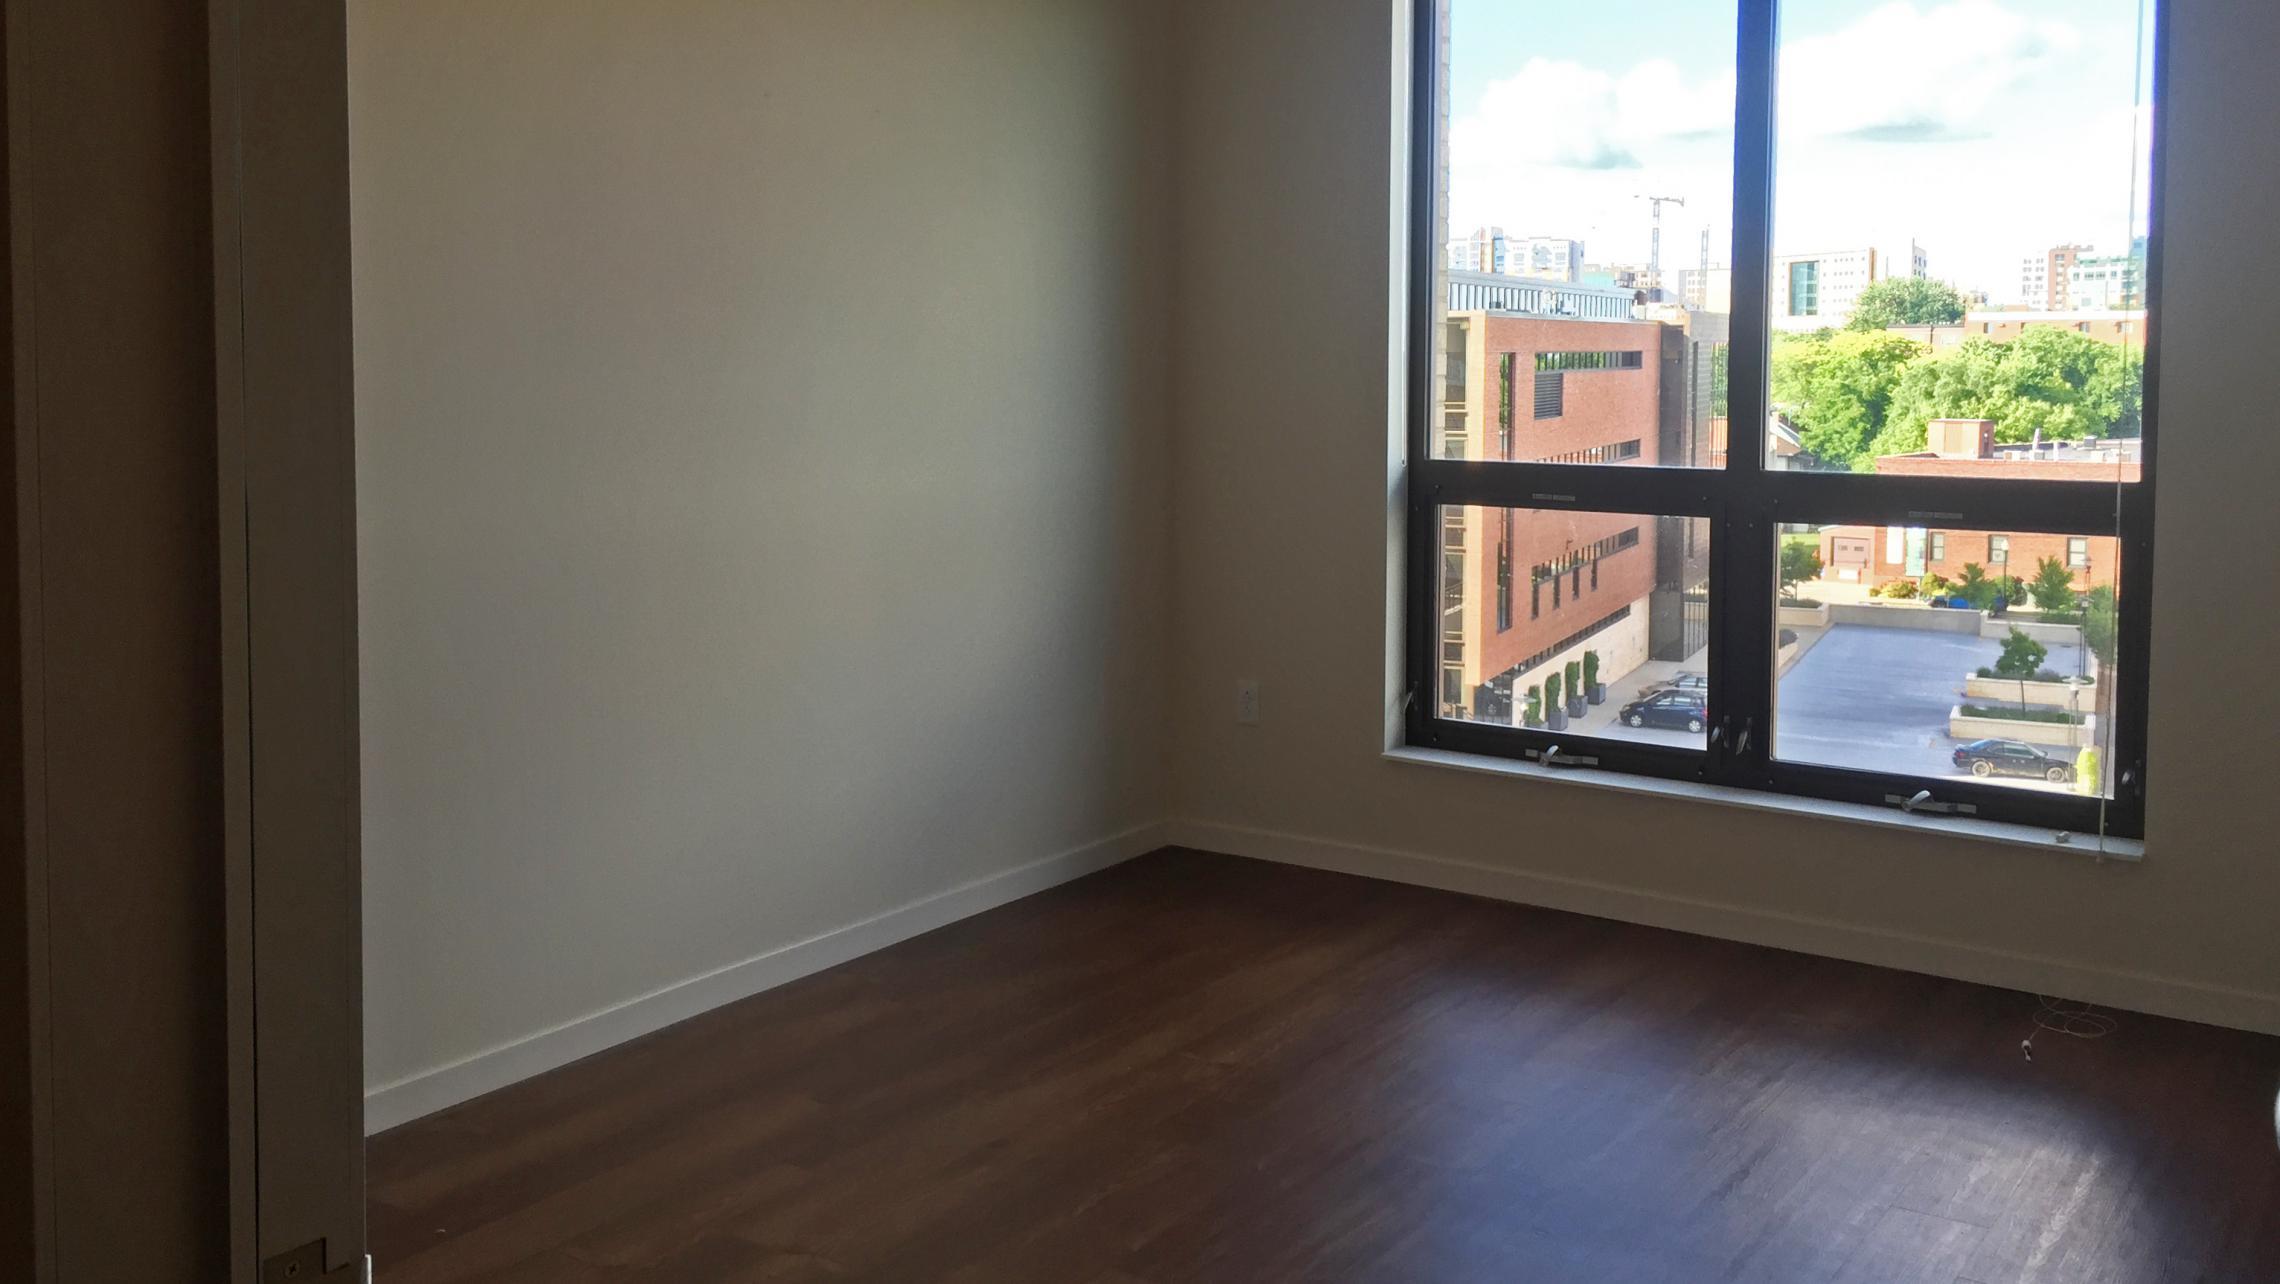 ULI Nine Line Apartments 519 - Bedroom Window